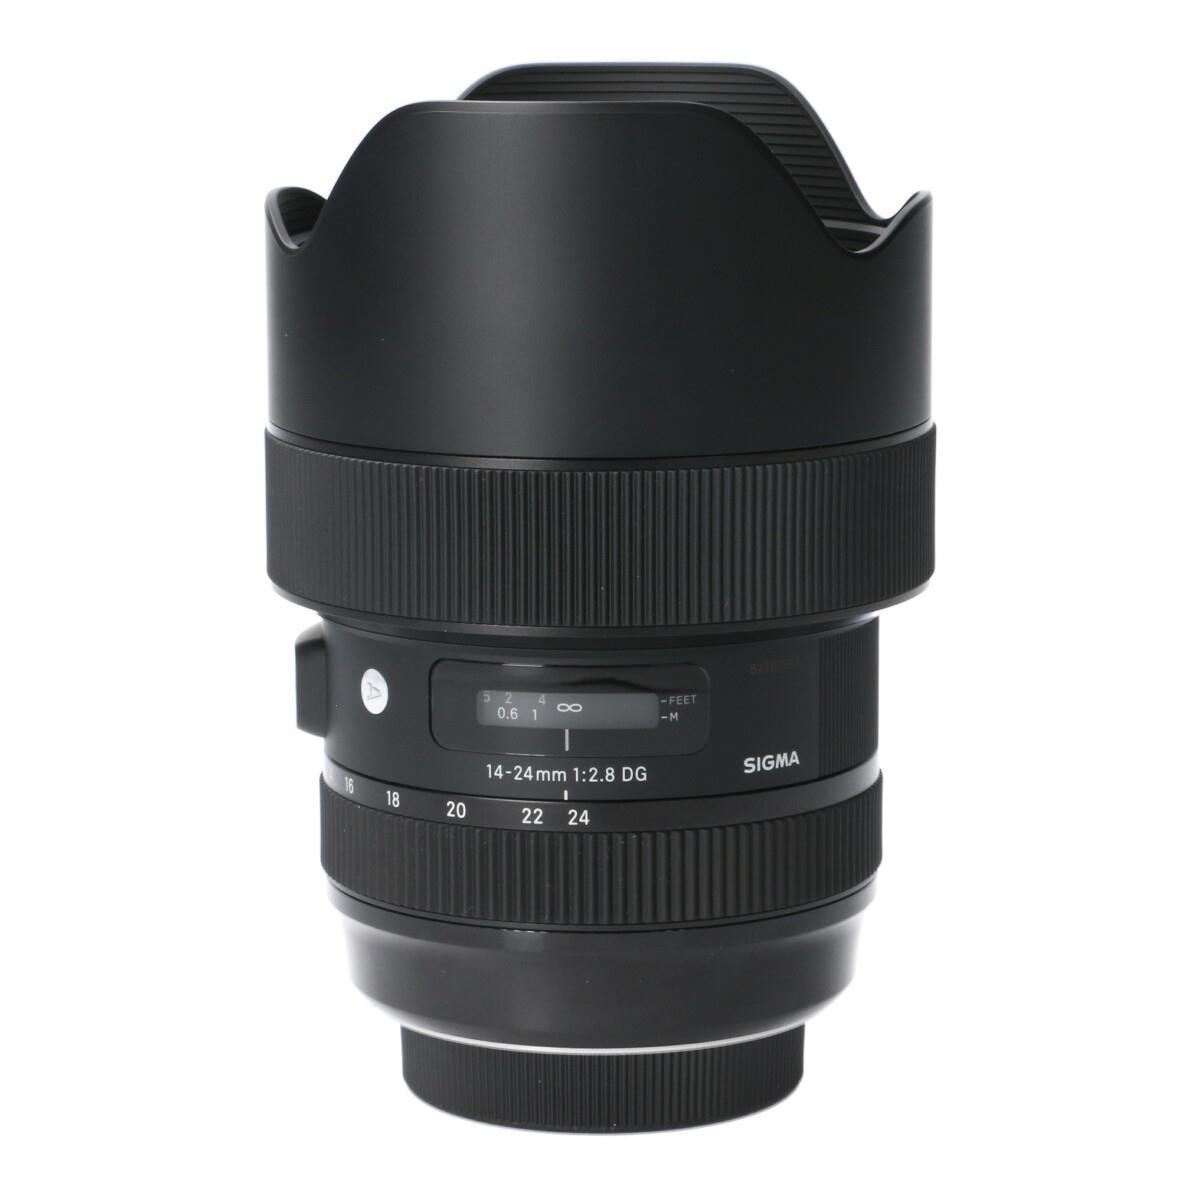 SIGMA SA(A)14-24mm F2.8DG HSM【中古】